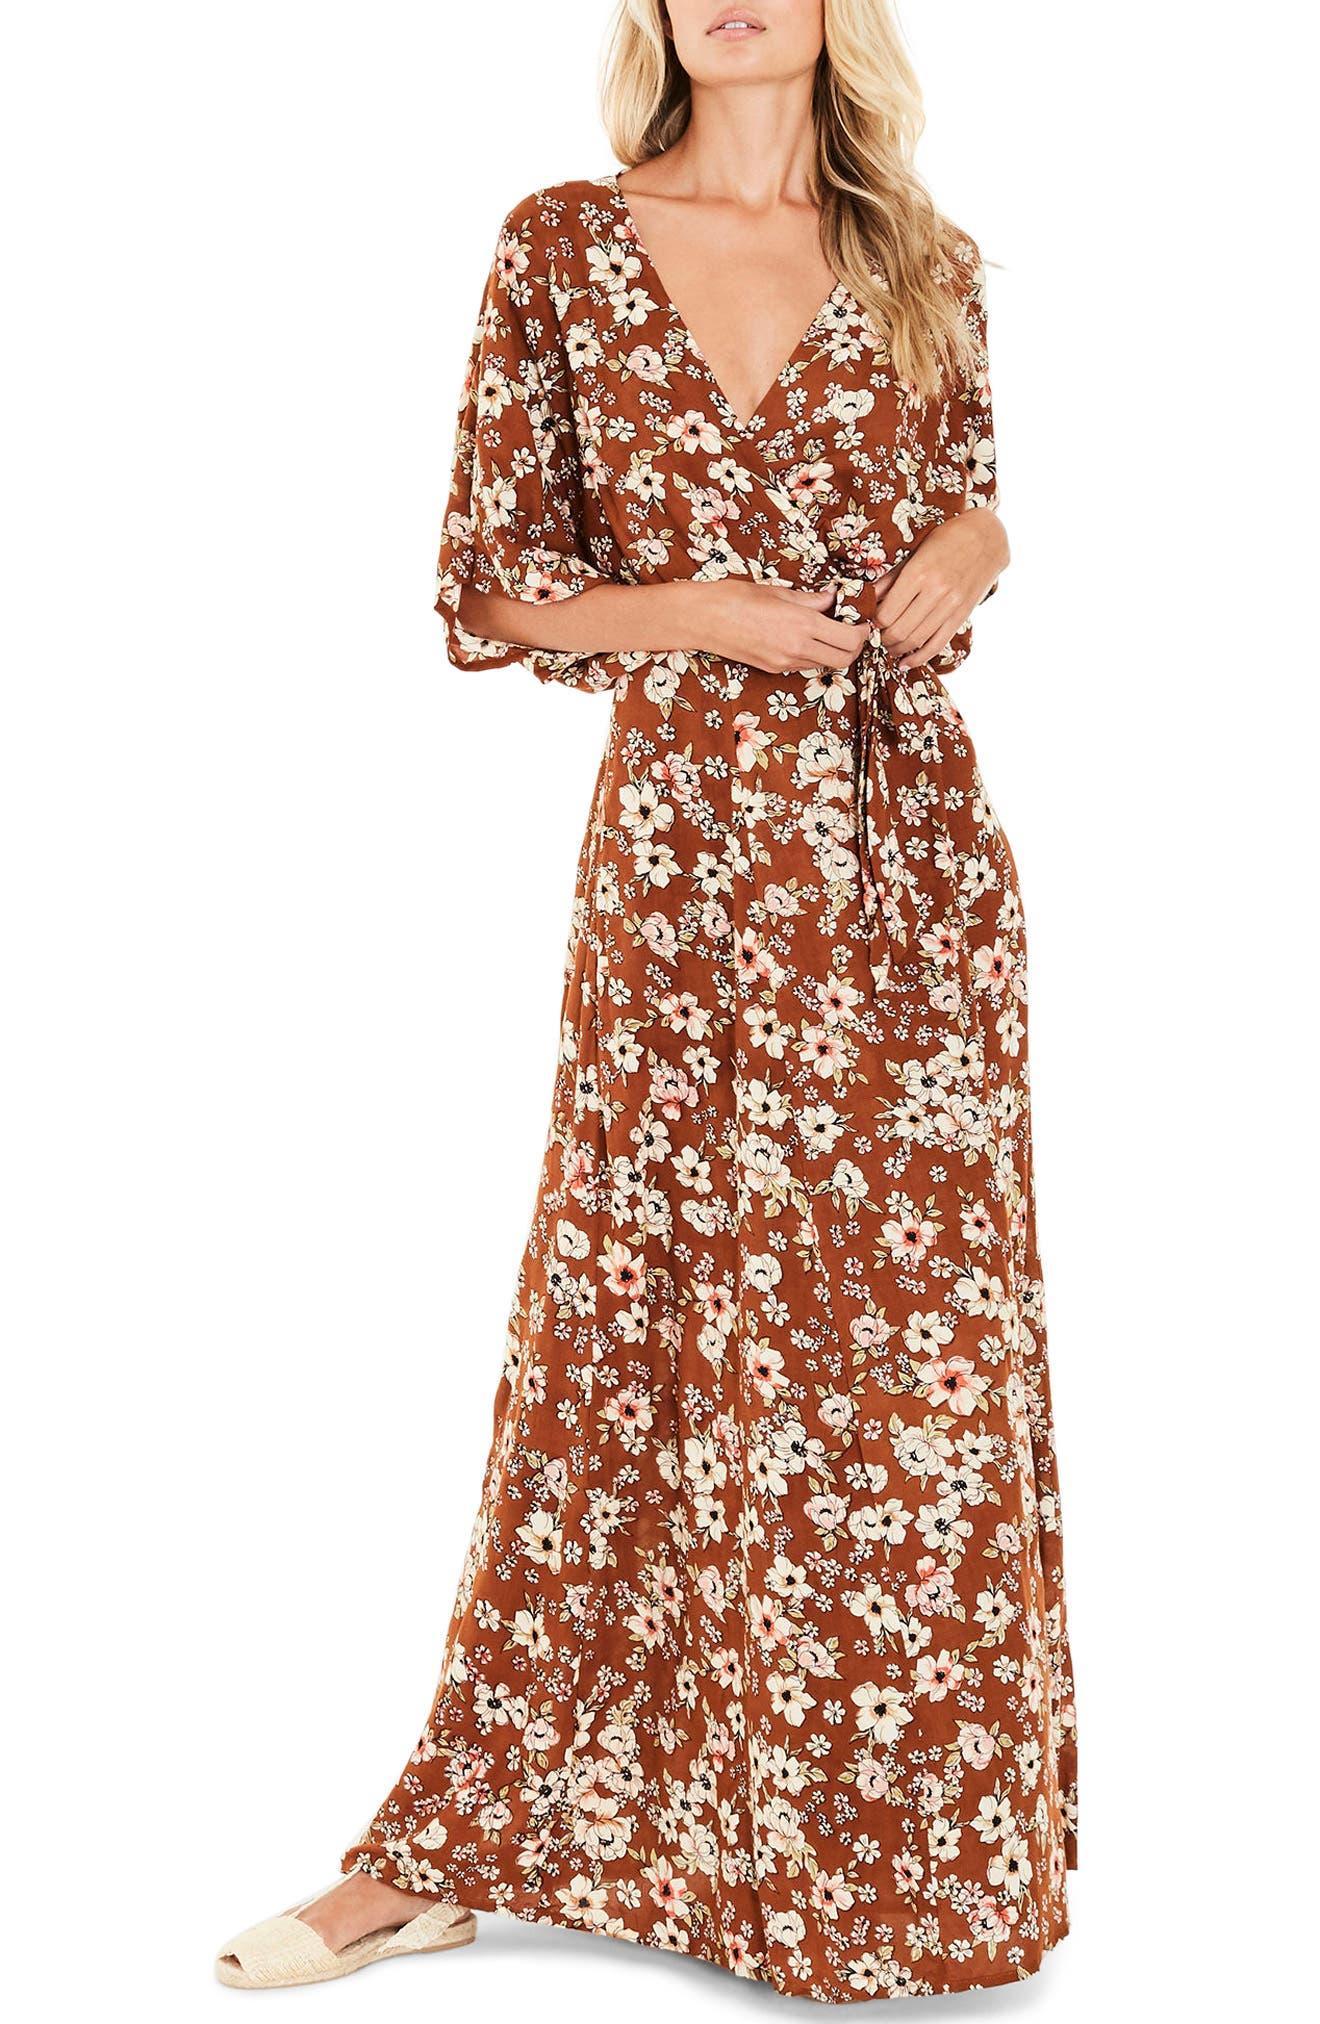 Bergamo Maxi Wrap Dress,                             Main thumbnail 1, color,                             Cecile Rose